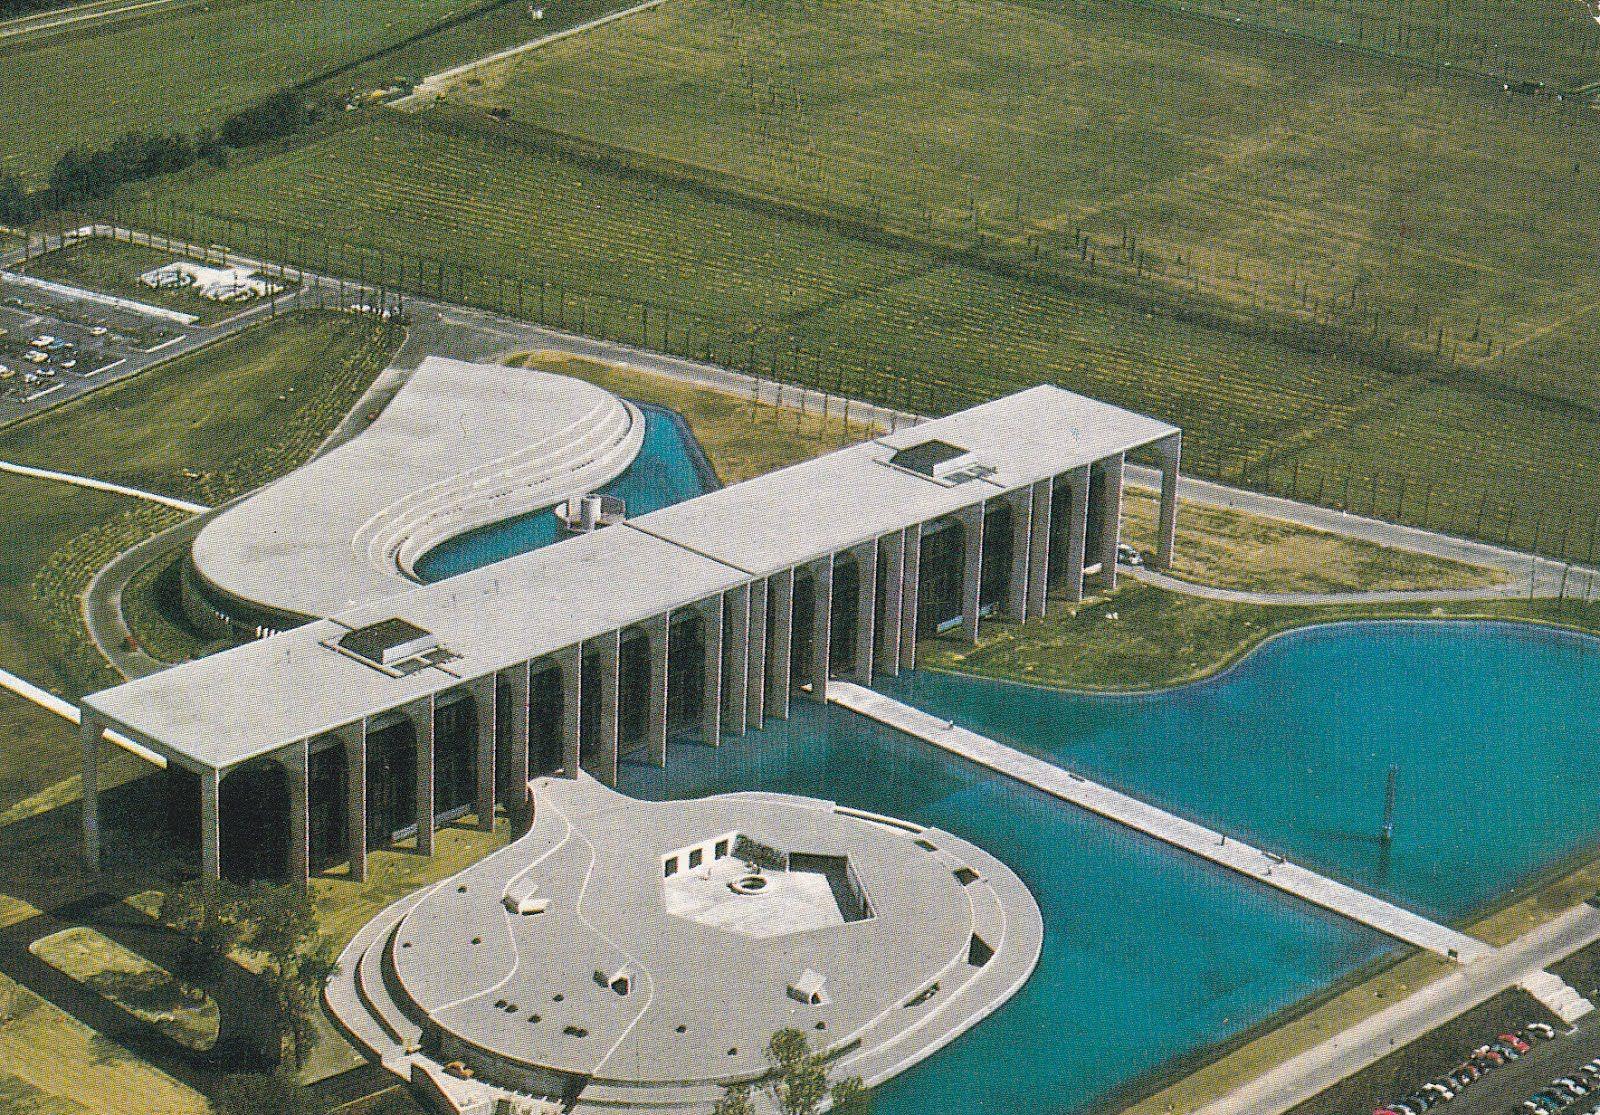 Mondadori Headquarters by Oscar Niemeyer – Milan, Italy